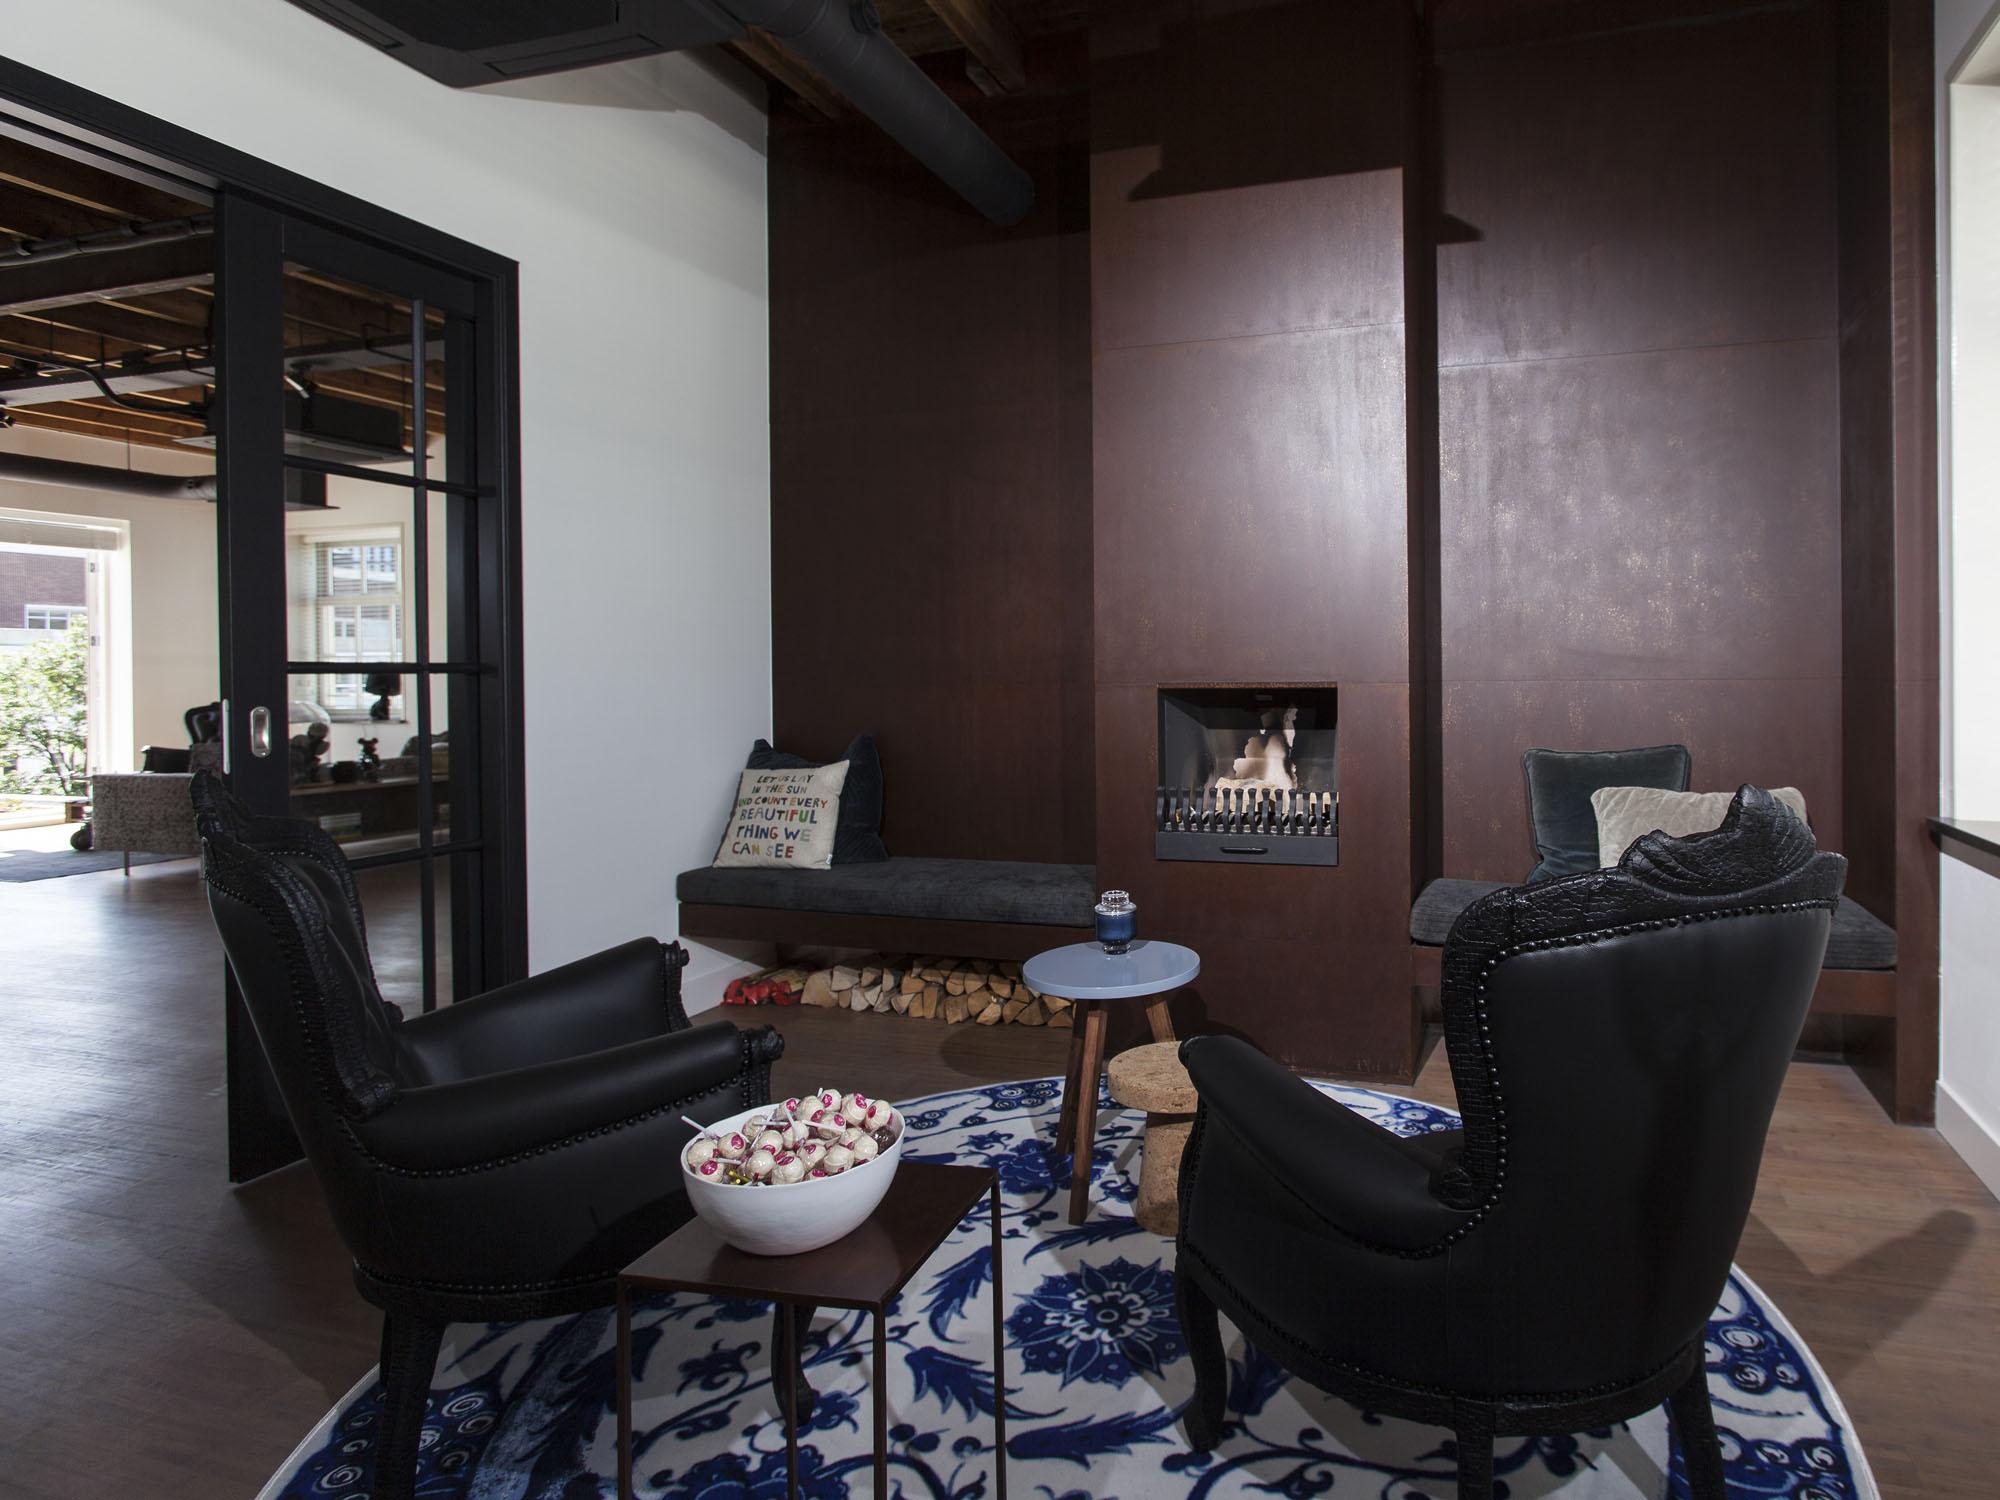 studio-hermanides-loft-office-11.jpg